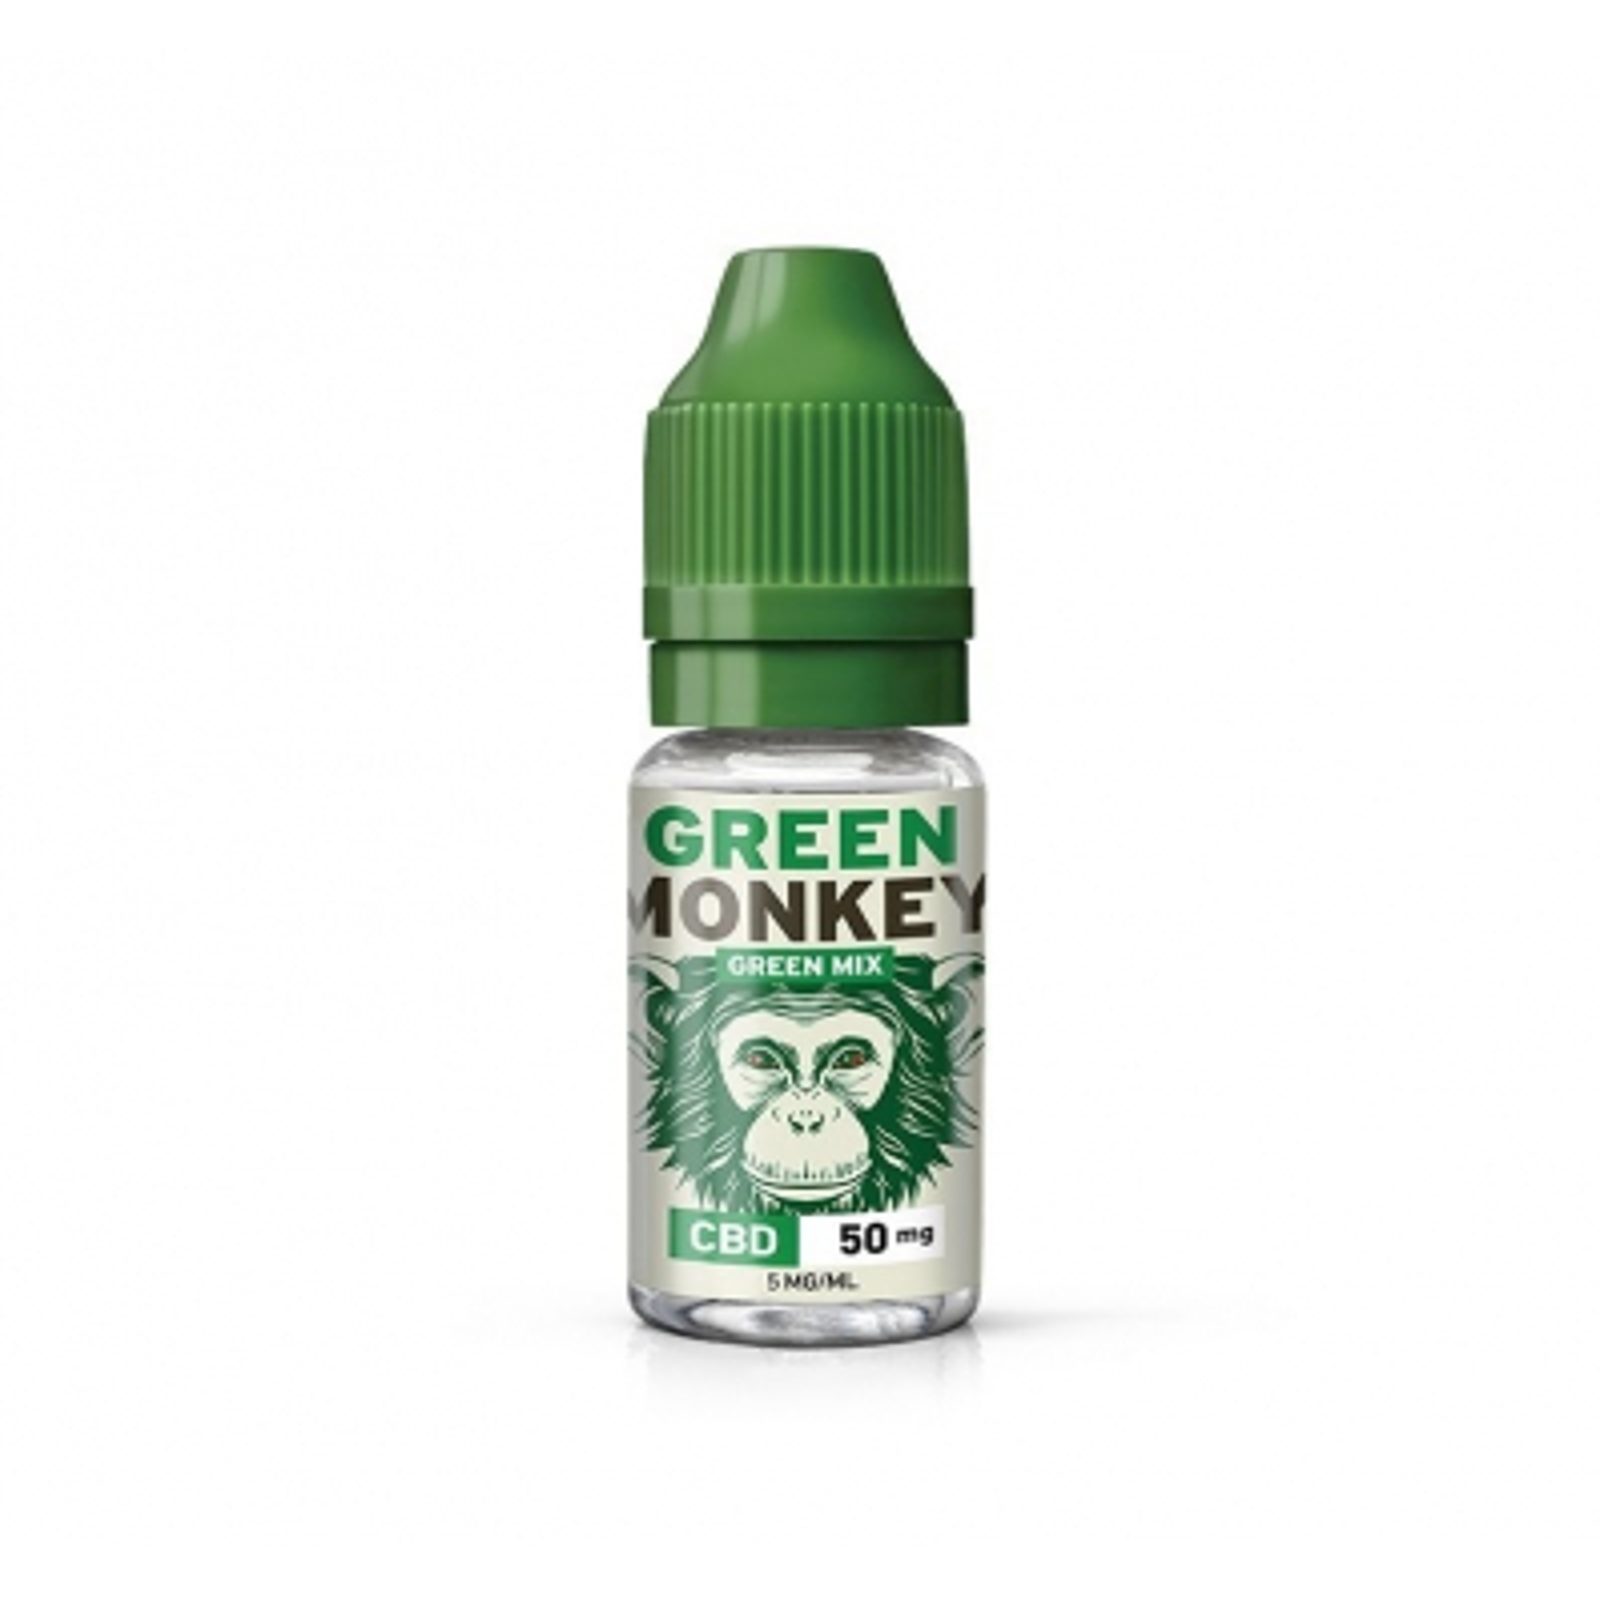 Green Mix - Green Monkey